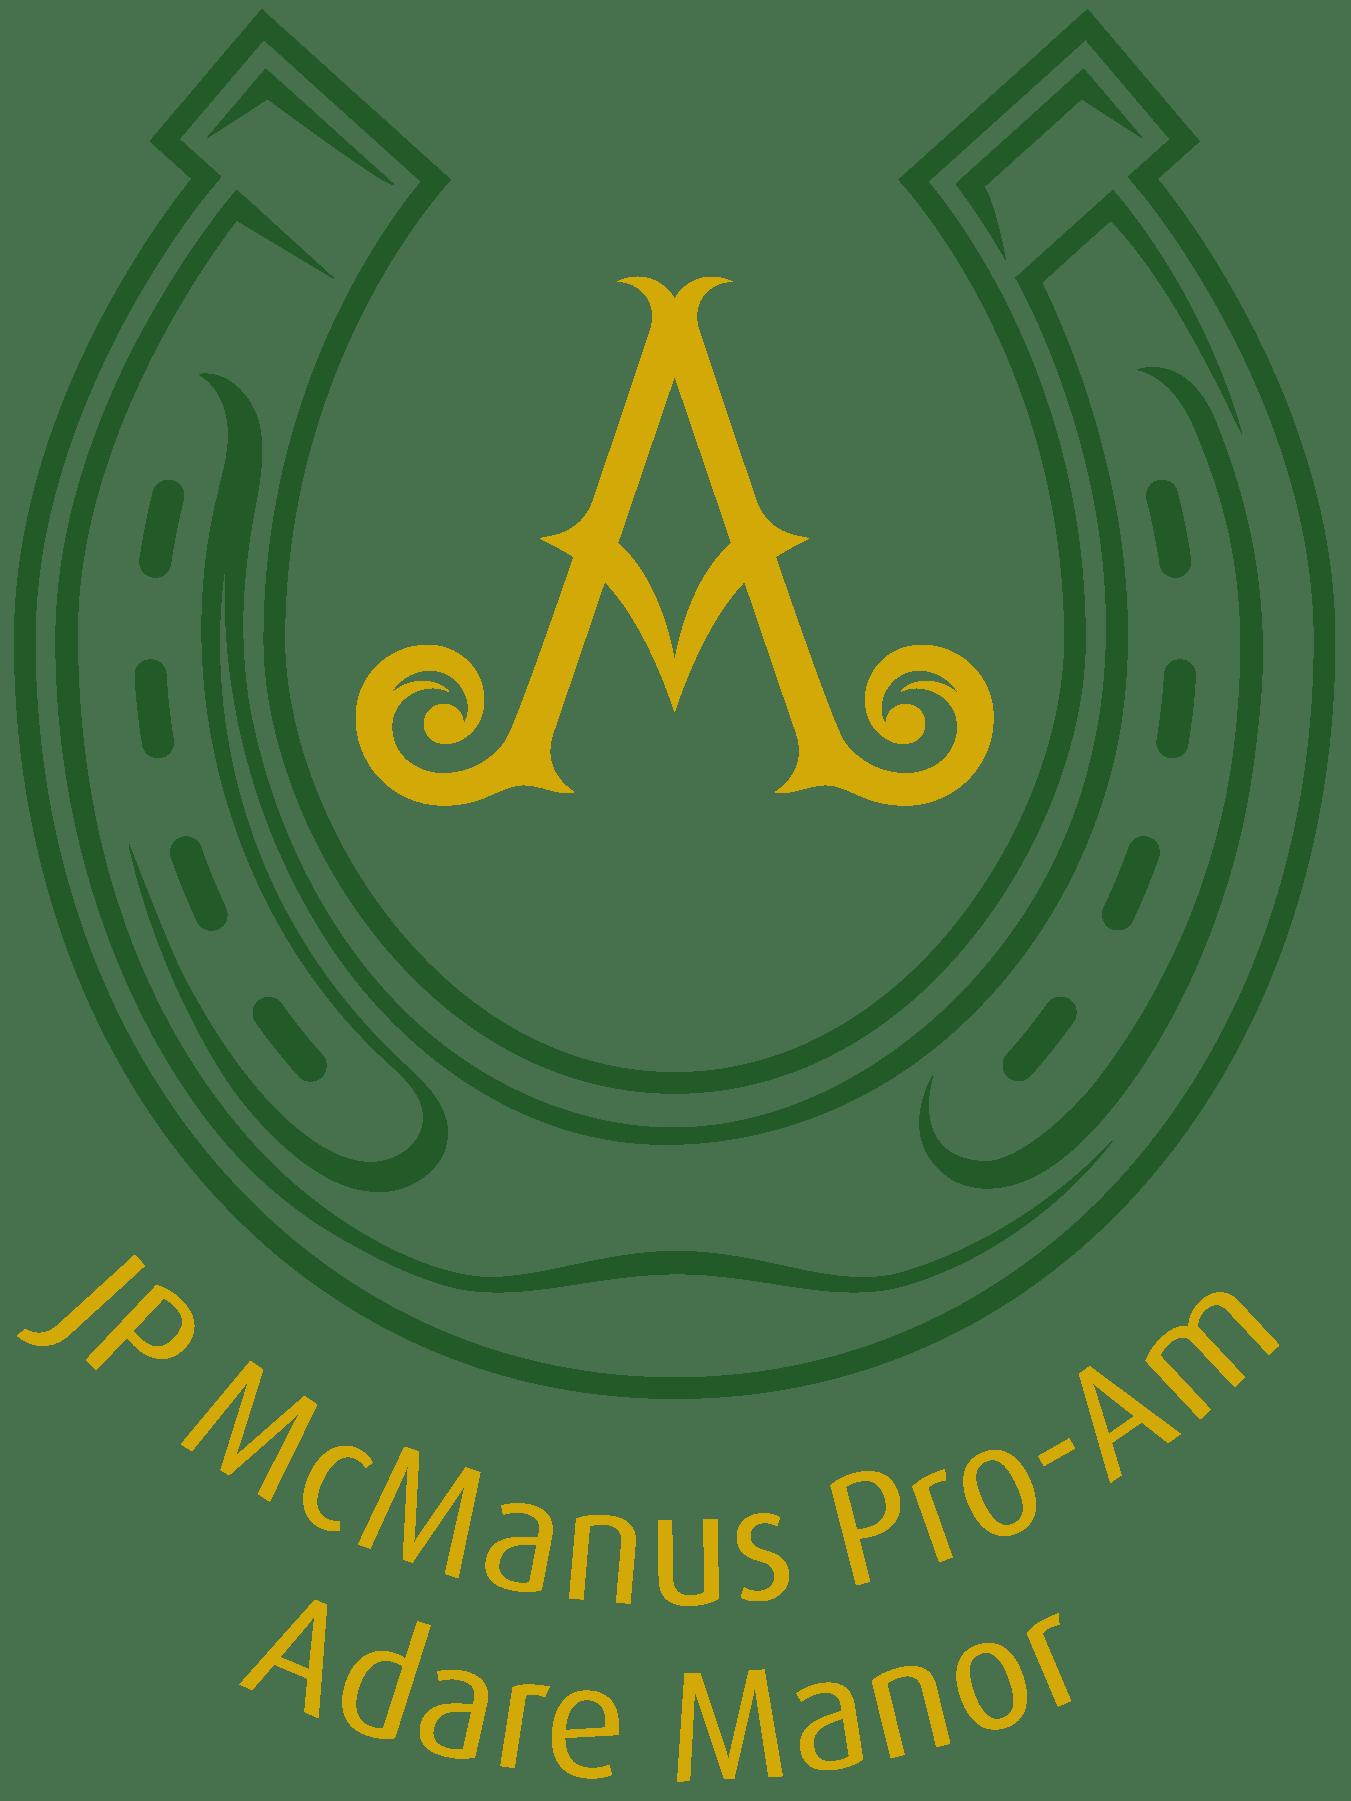 JP McManus Pro-Am Adare Manor